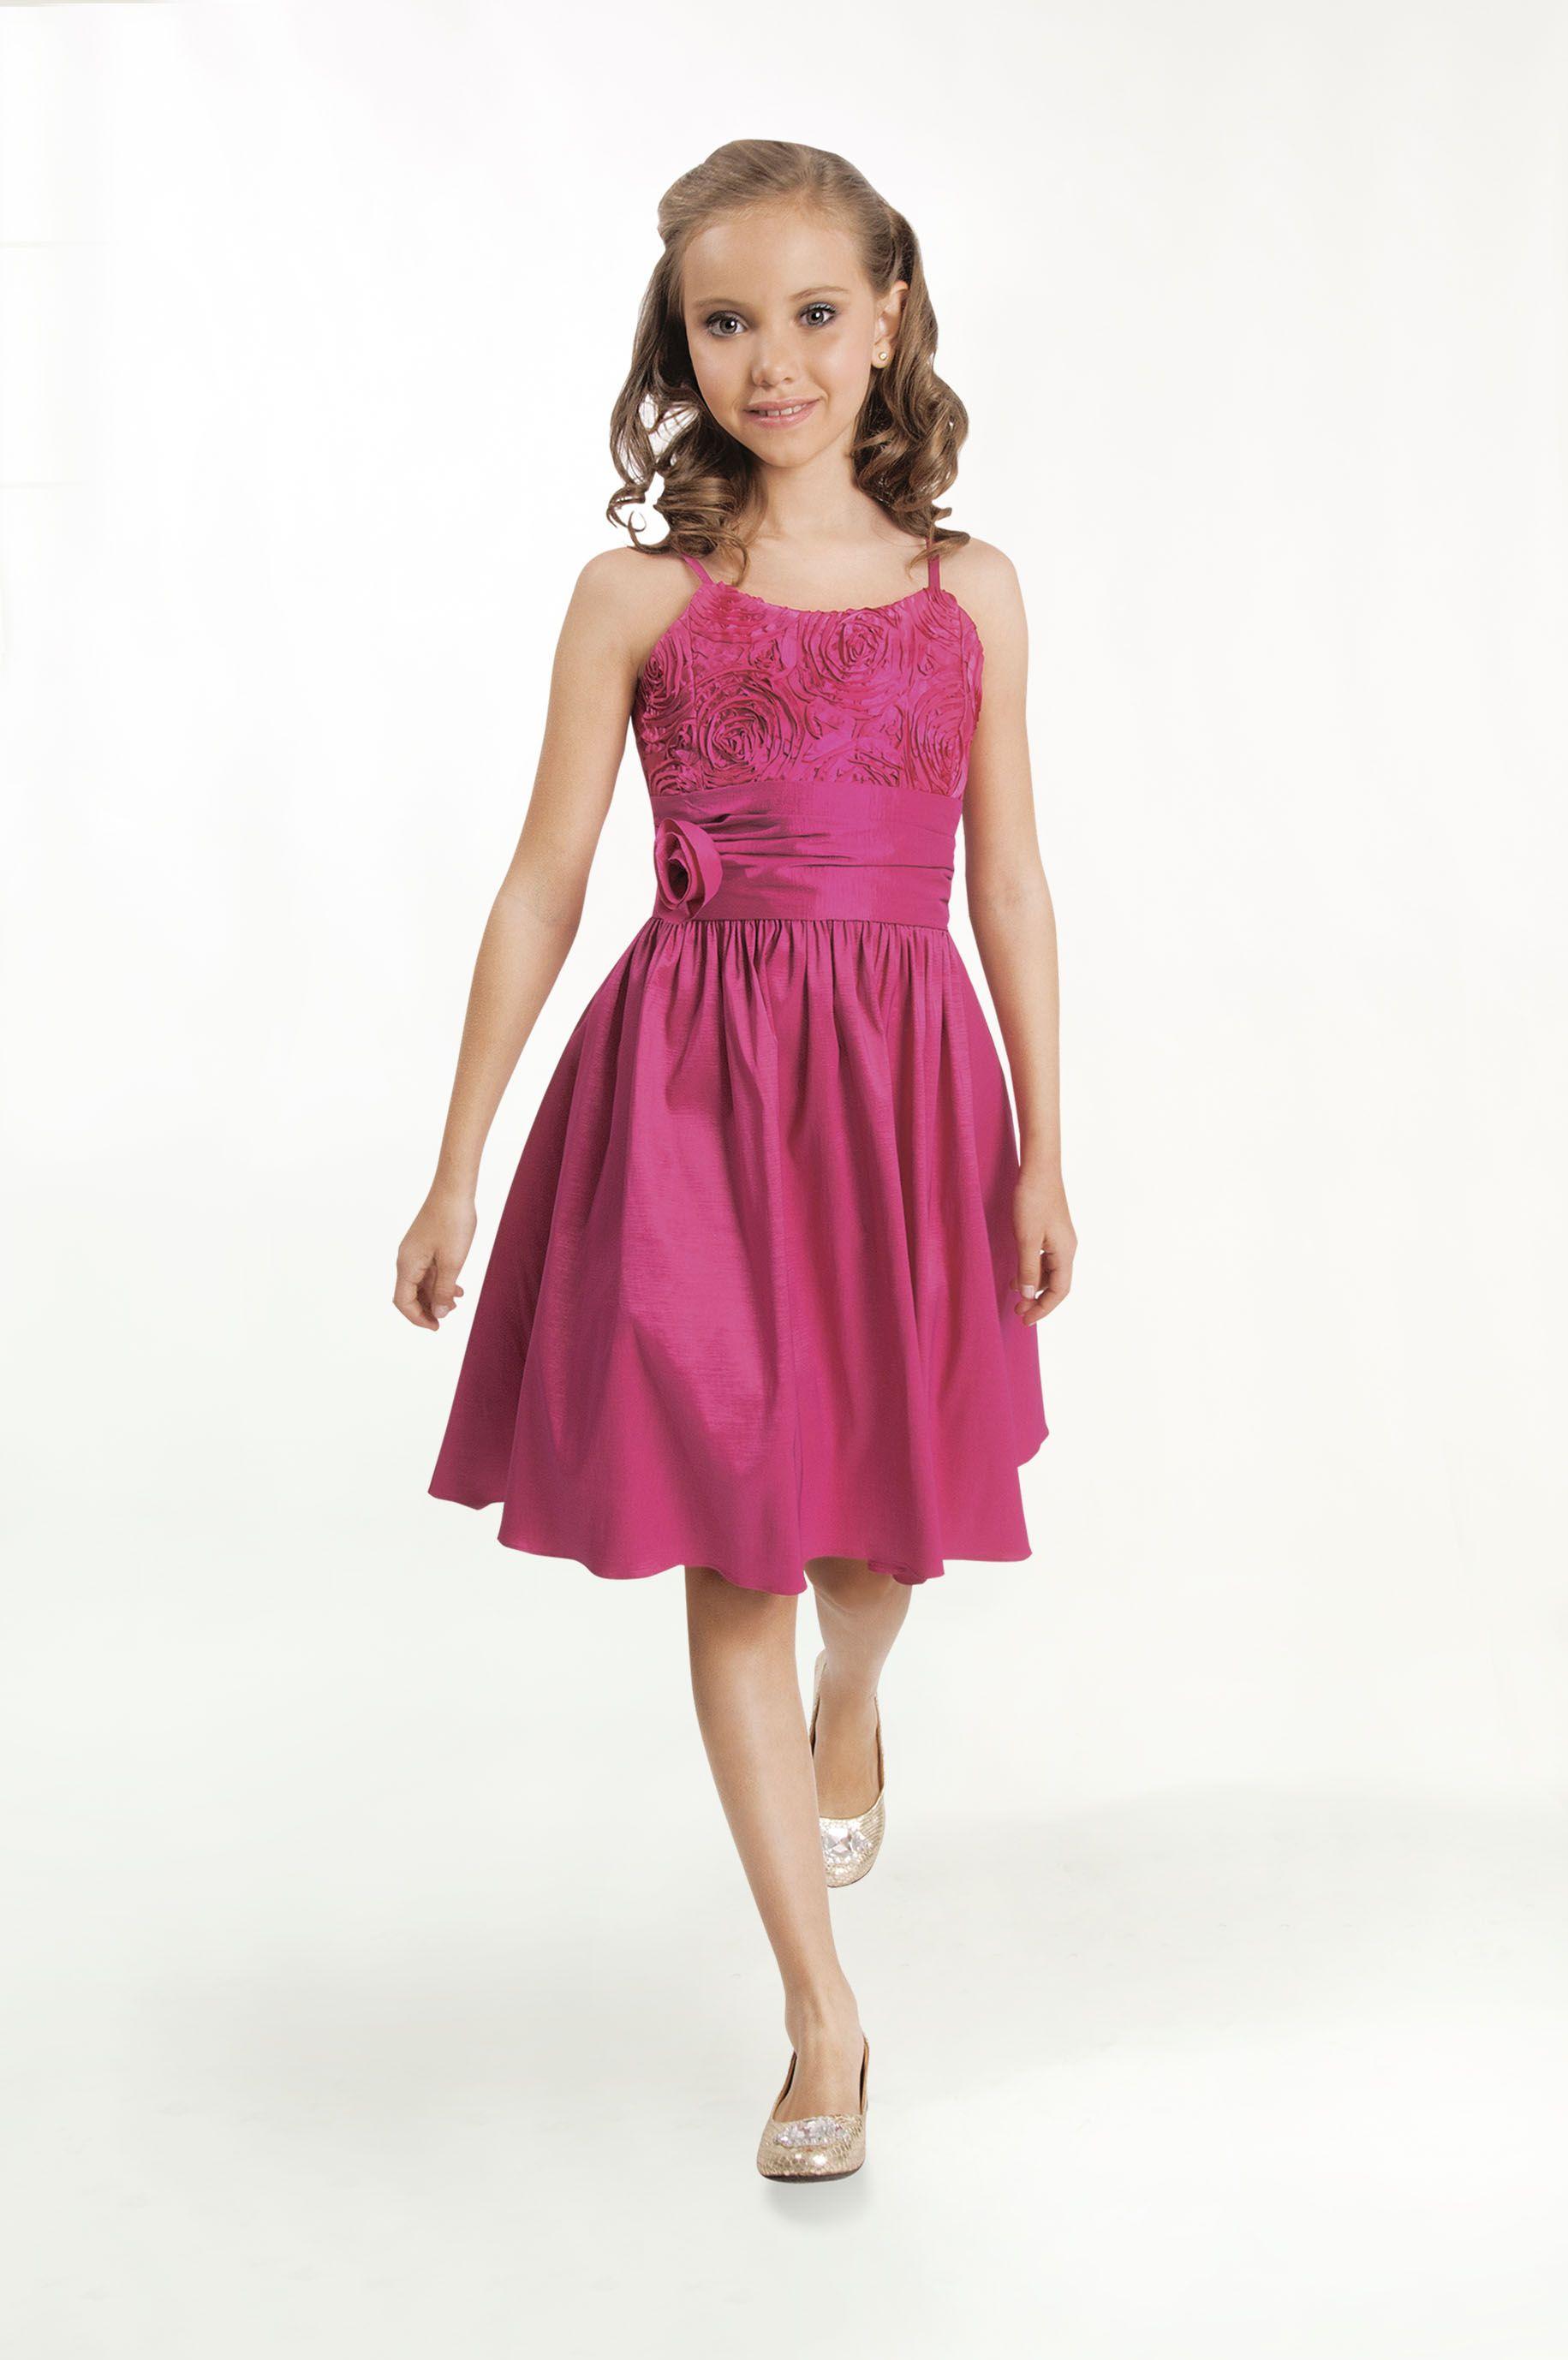 Modelo Vestido 3CC02123 - $999 | vestidos de noche | Pinterest ...